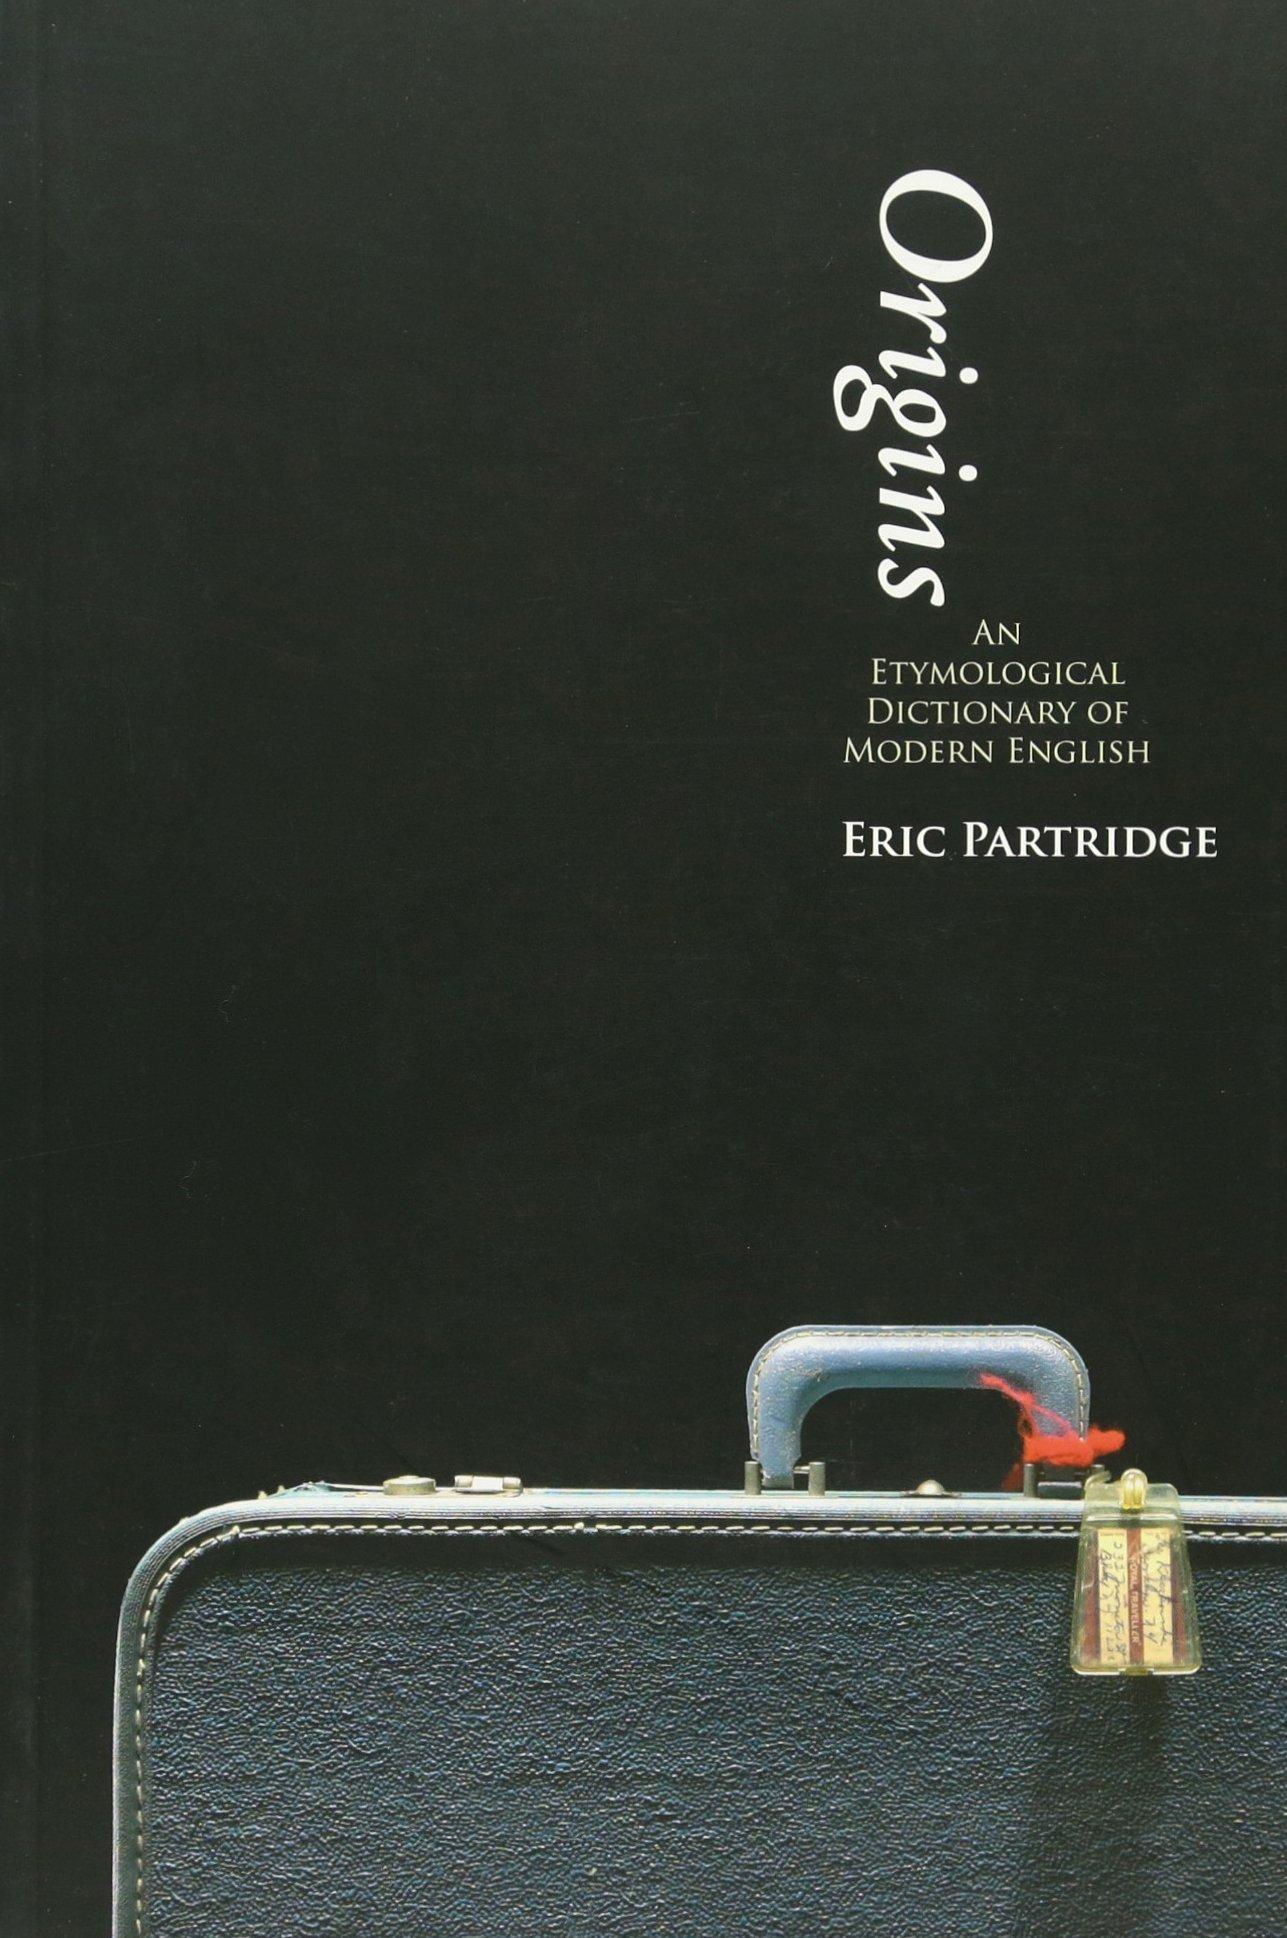 Origins: A Short Etymological Dictionary of Modern English: Amazon.co.uk:  Eric Partridge: 9780415474337: Books